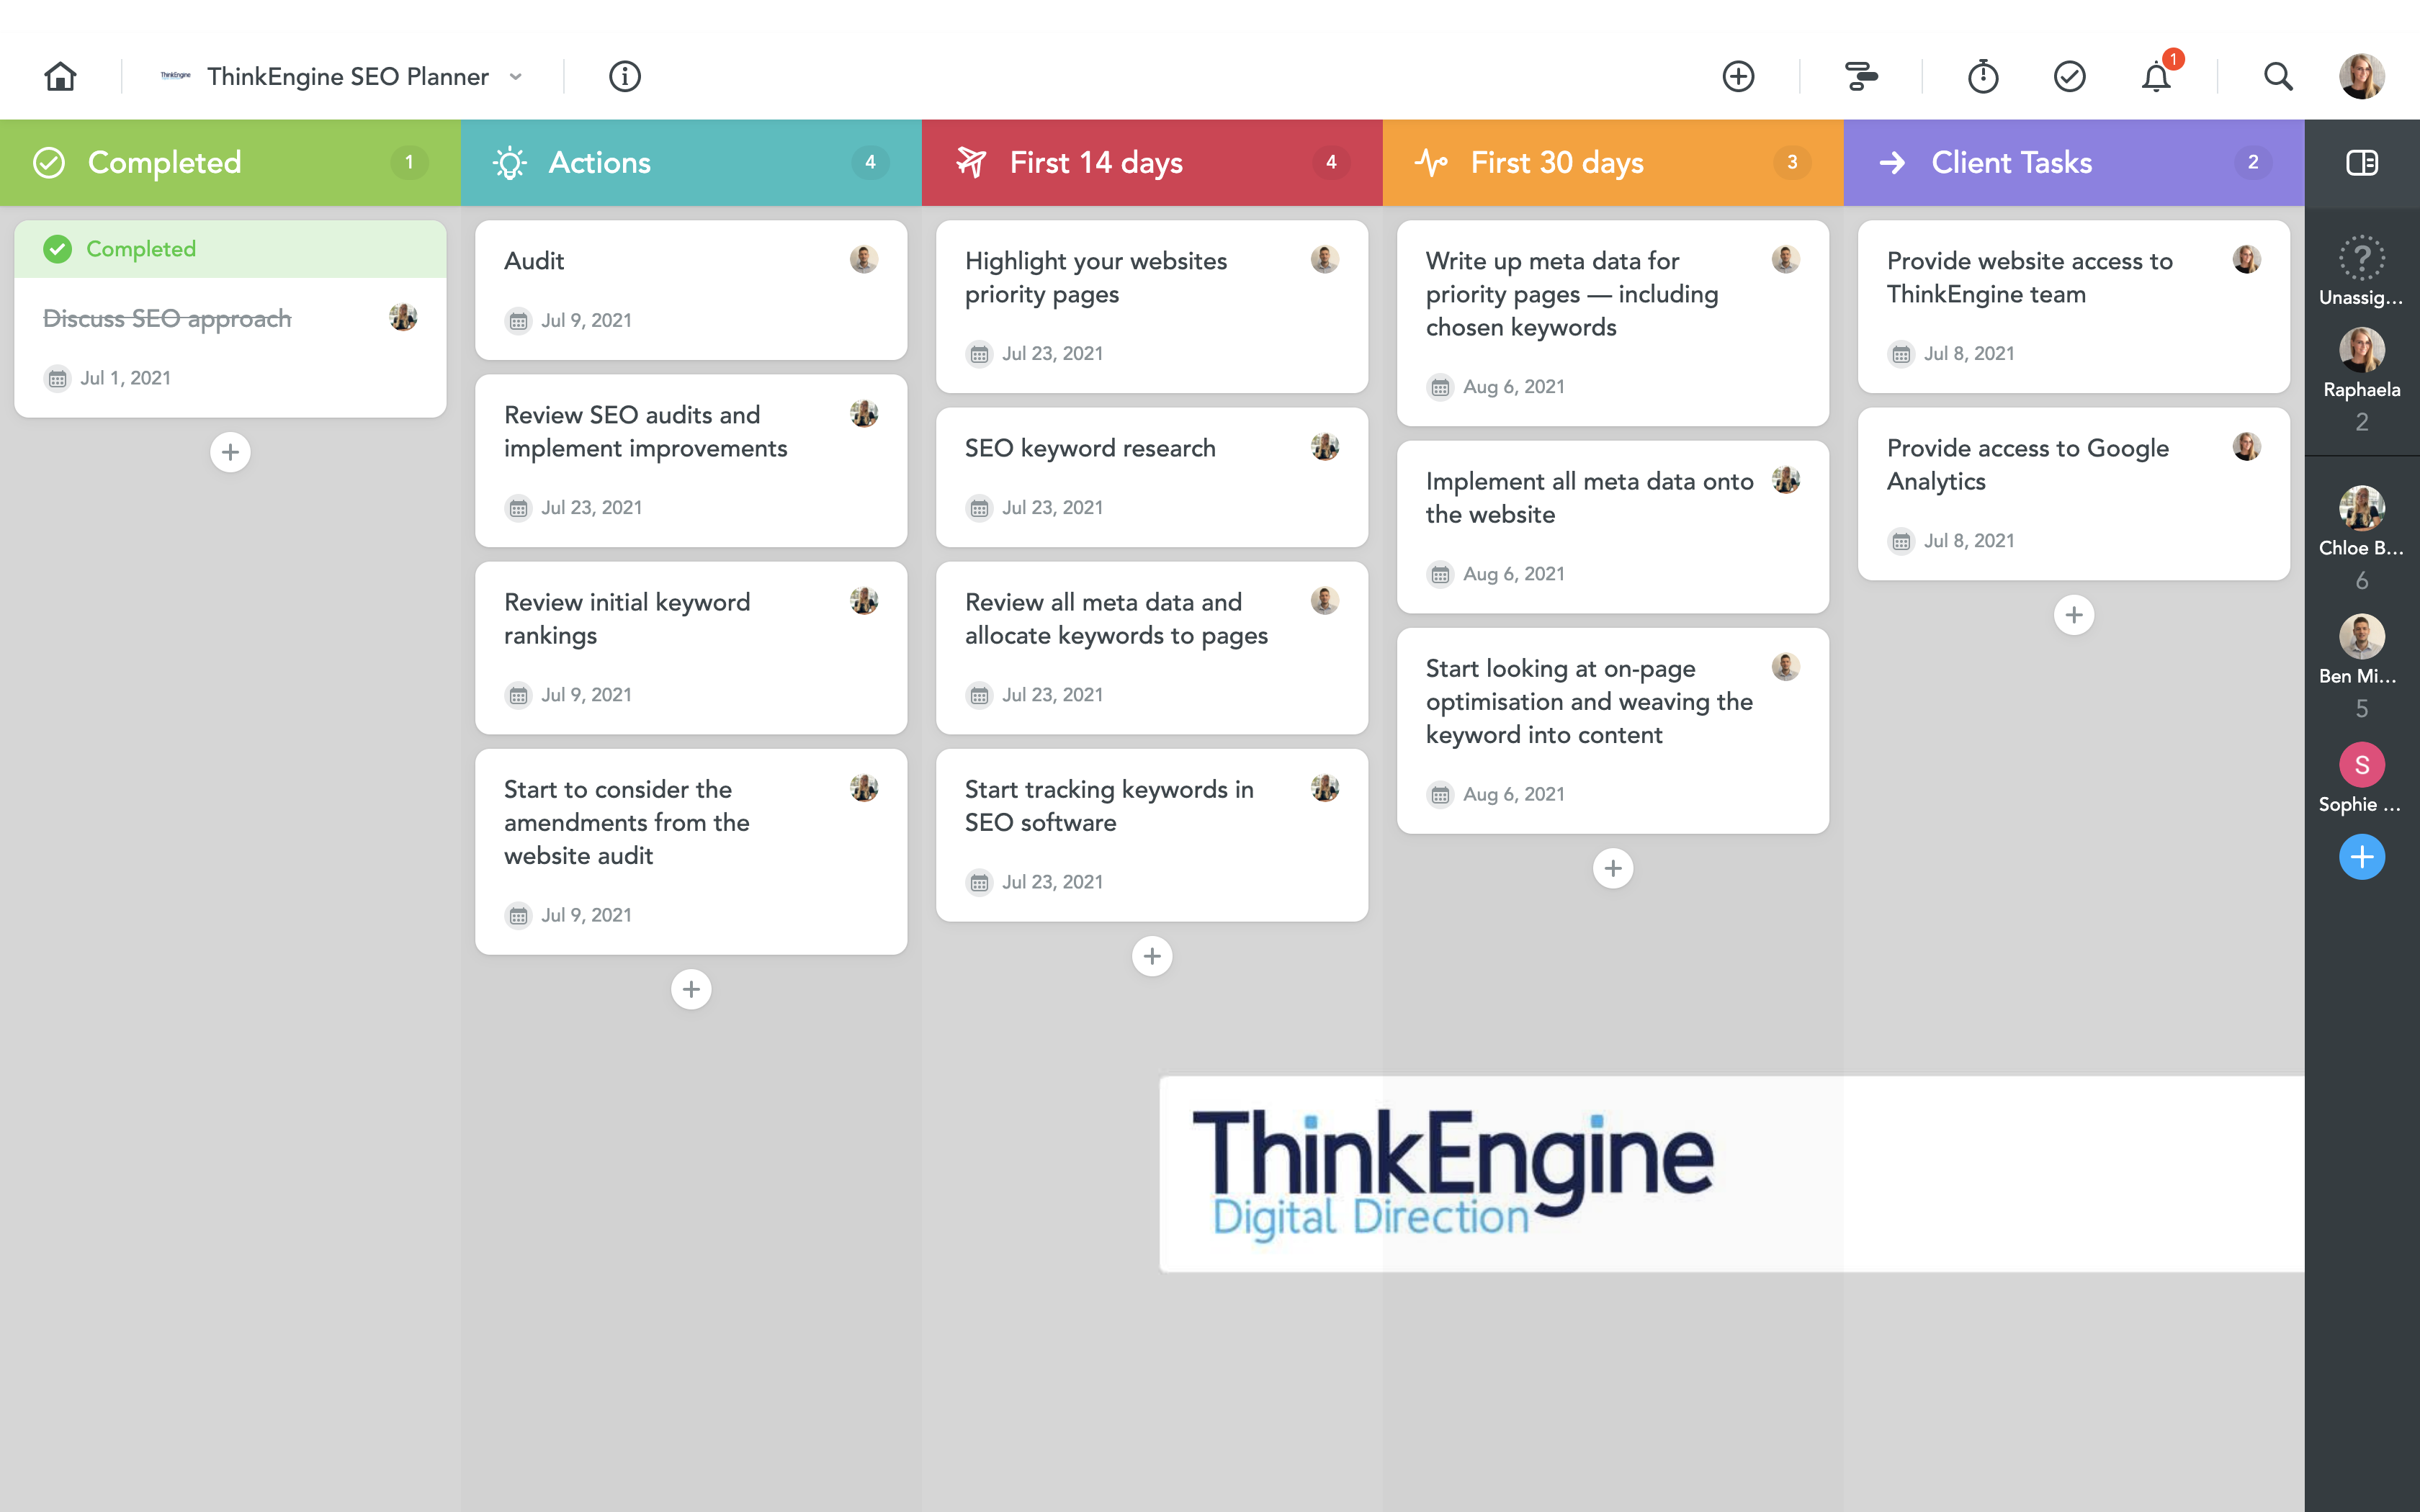 ThinkEngine SEO Planner